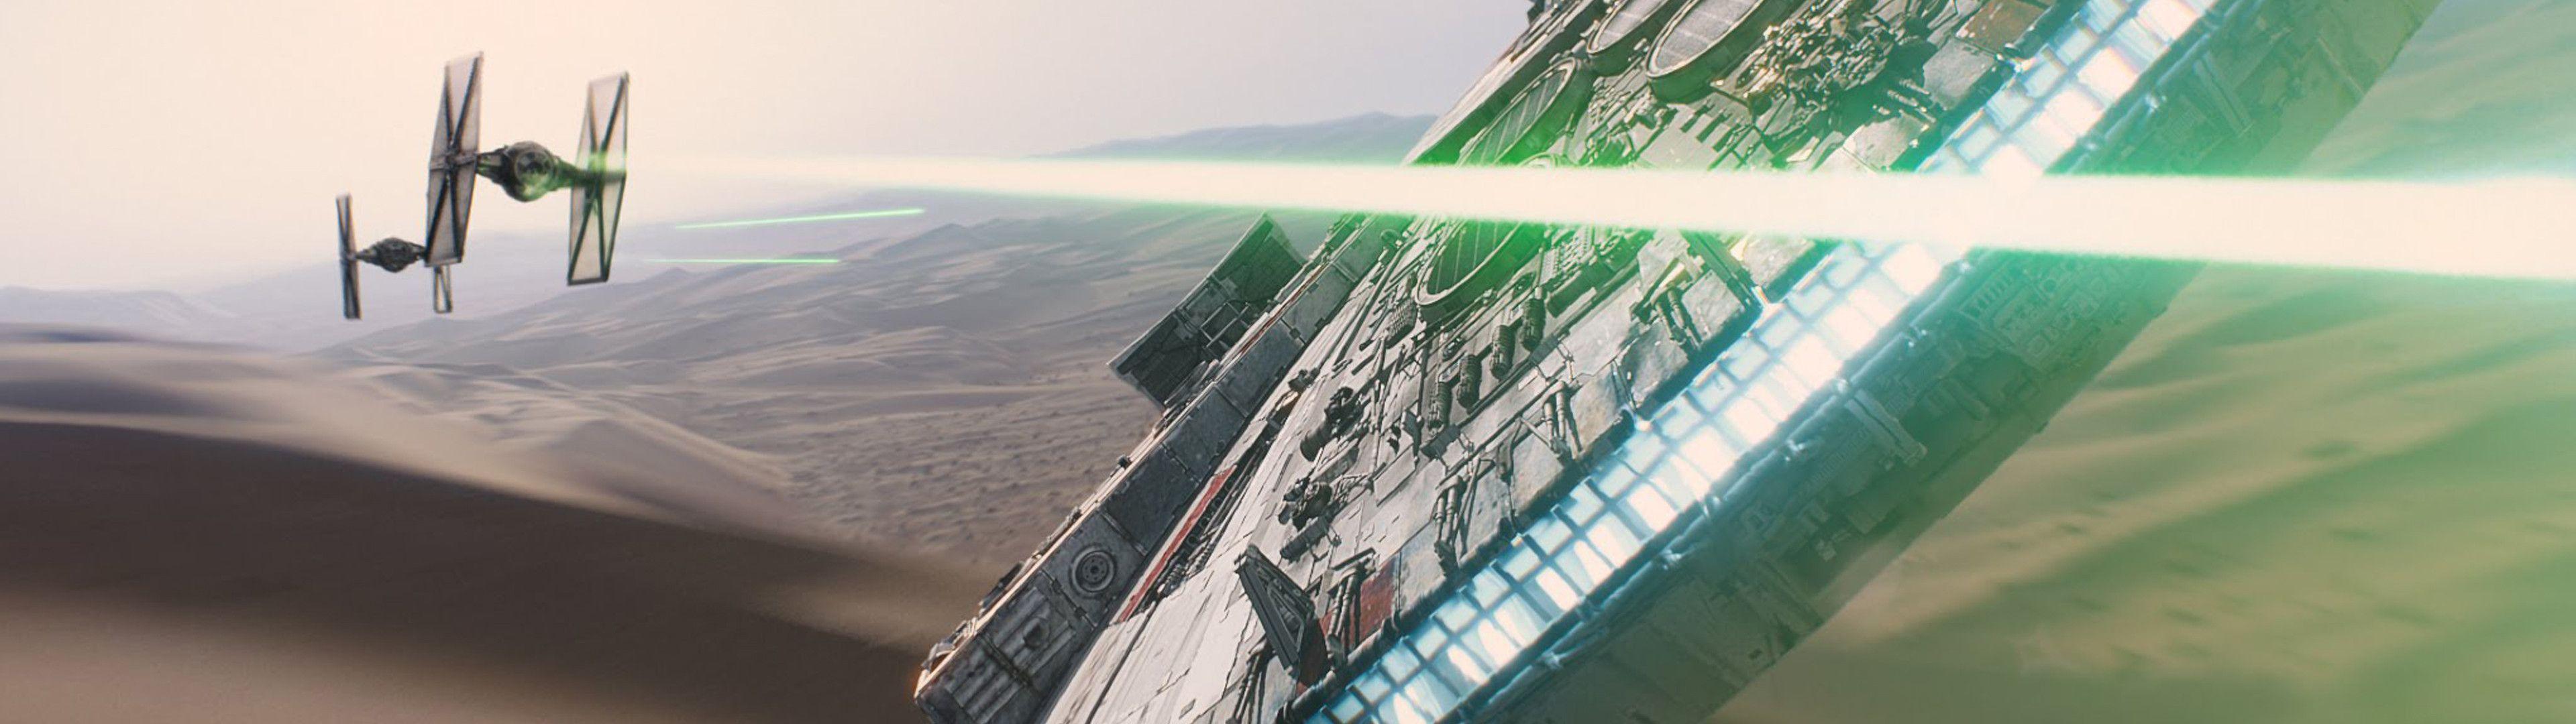 34 3840x1080 Star Wars Wallpaper 2k Inspirational Pictures In 2020 Star Wars Vii Star Wars 7 Star Wars Episodes